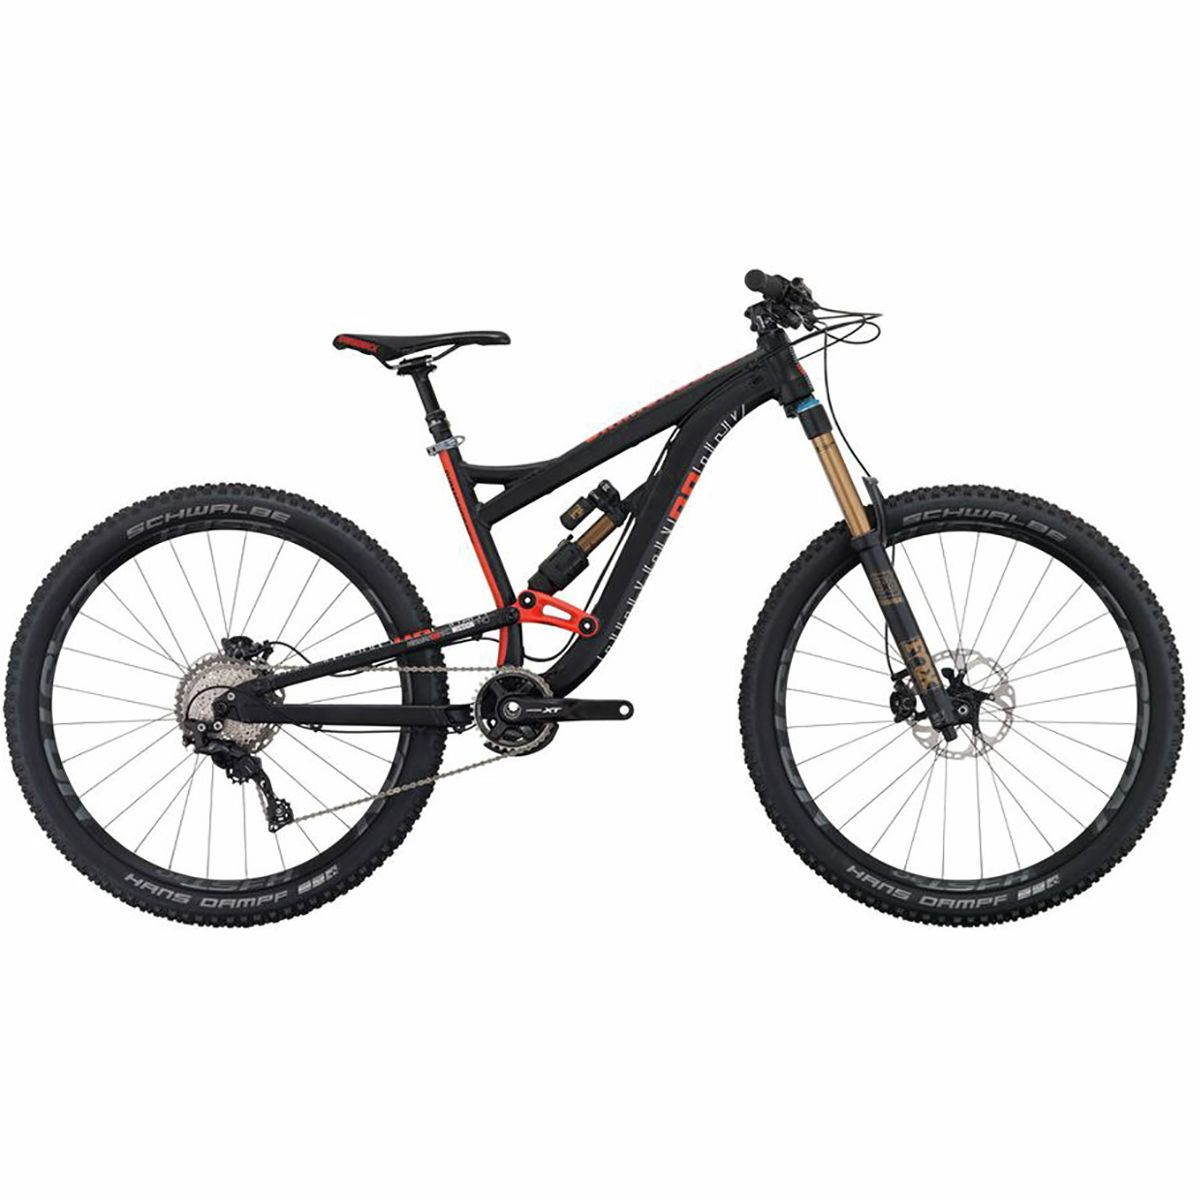 Diamondback Mission Pro XT Complete Mountain Bike - 2016 DMB002T